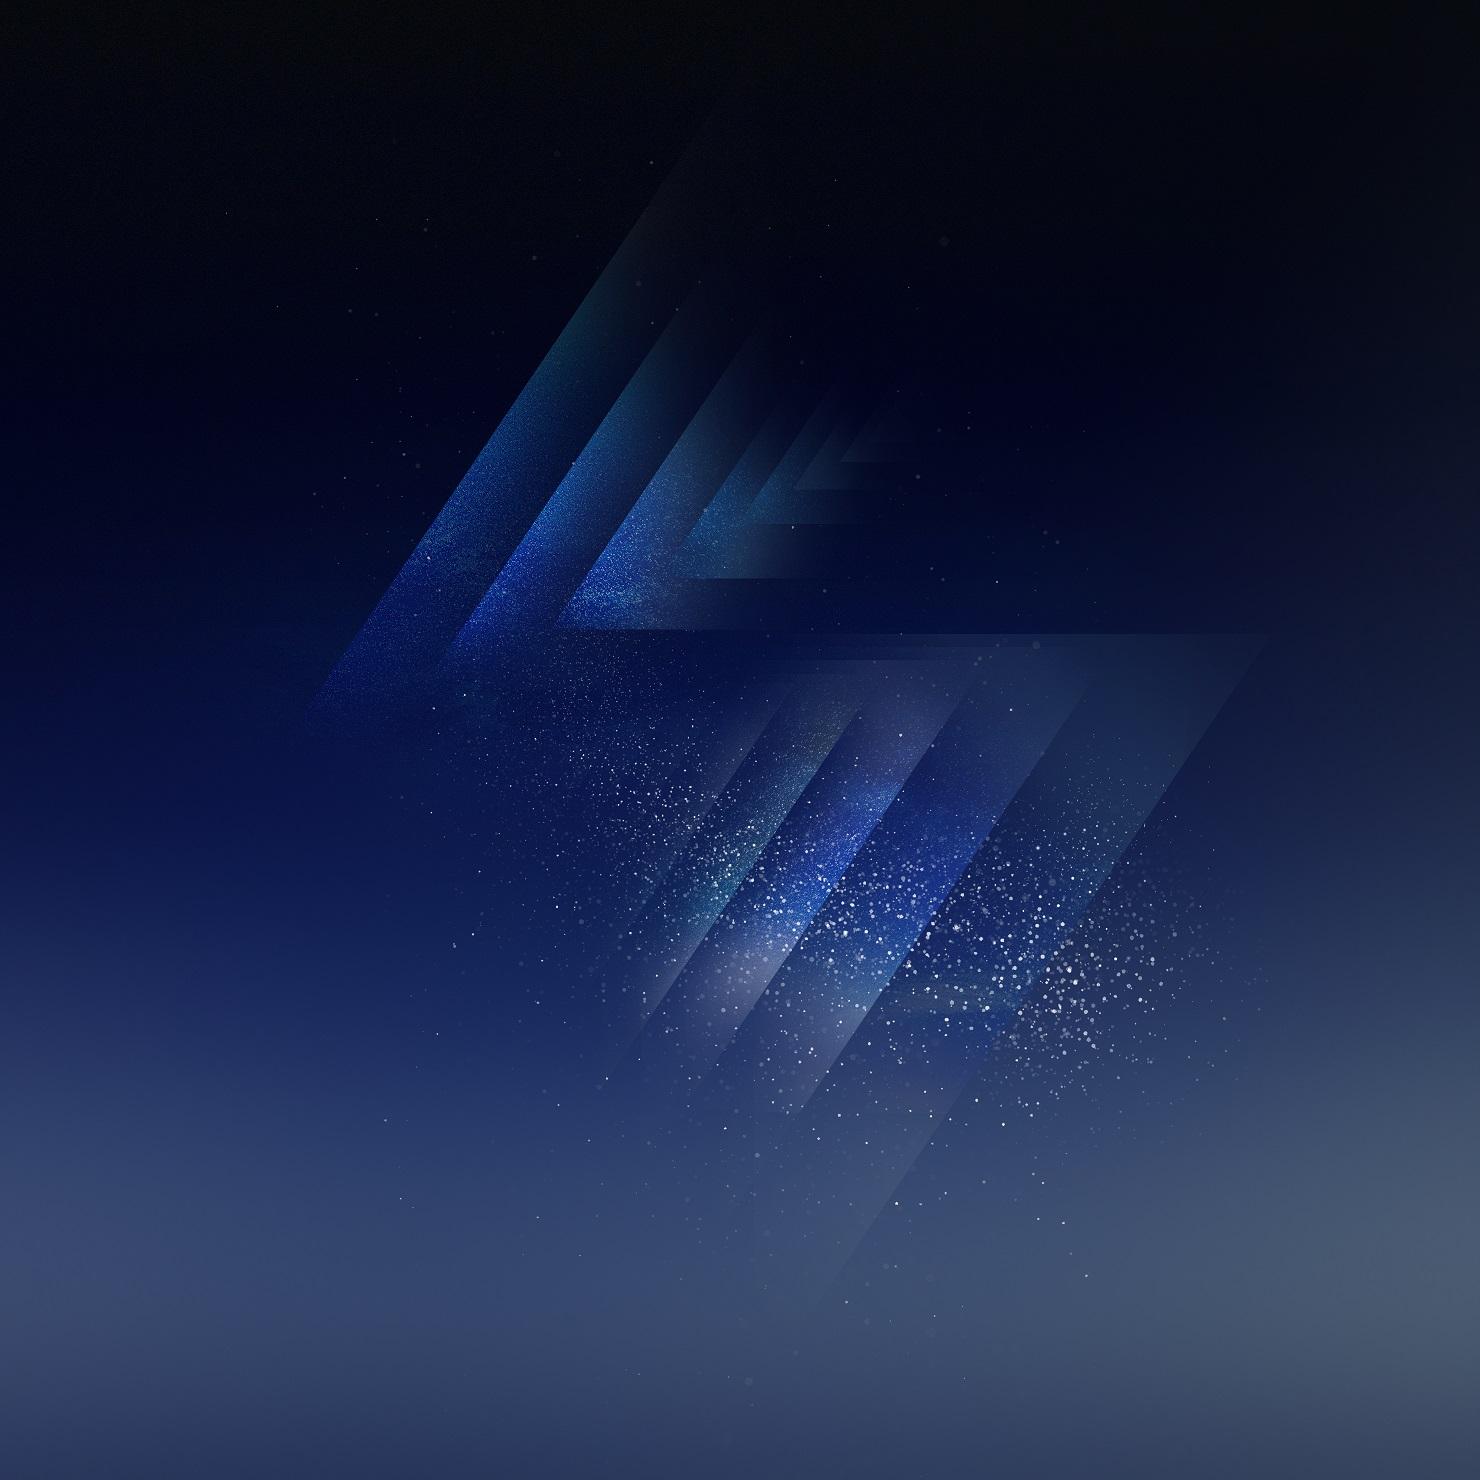 Galaxy S8 wallpaper (1)